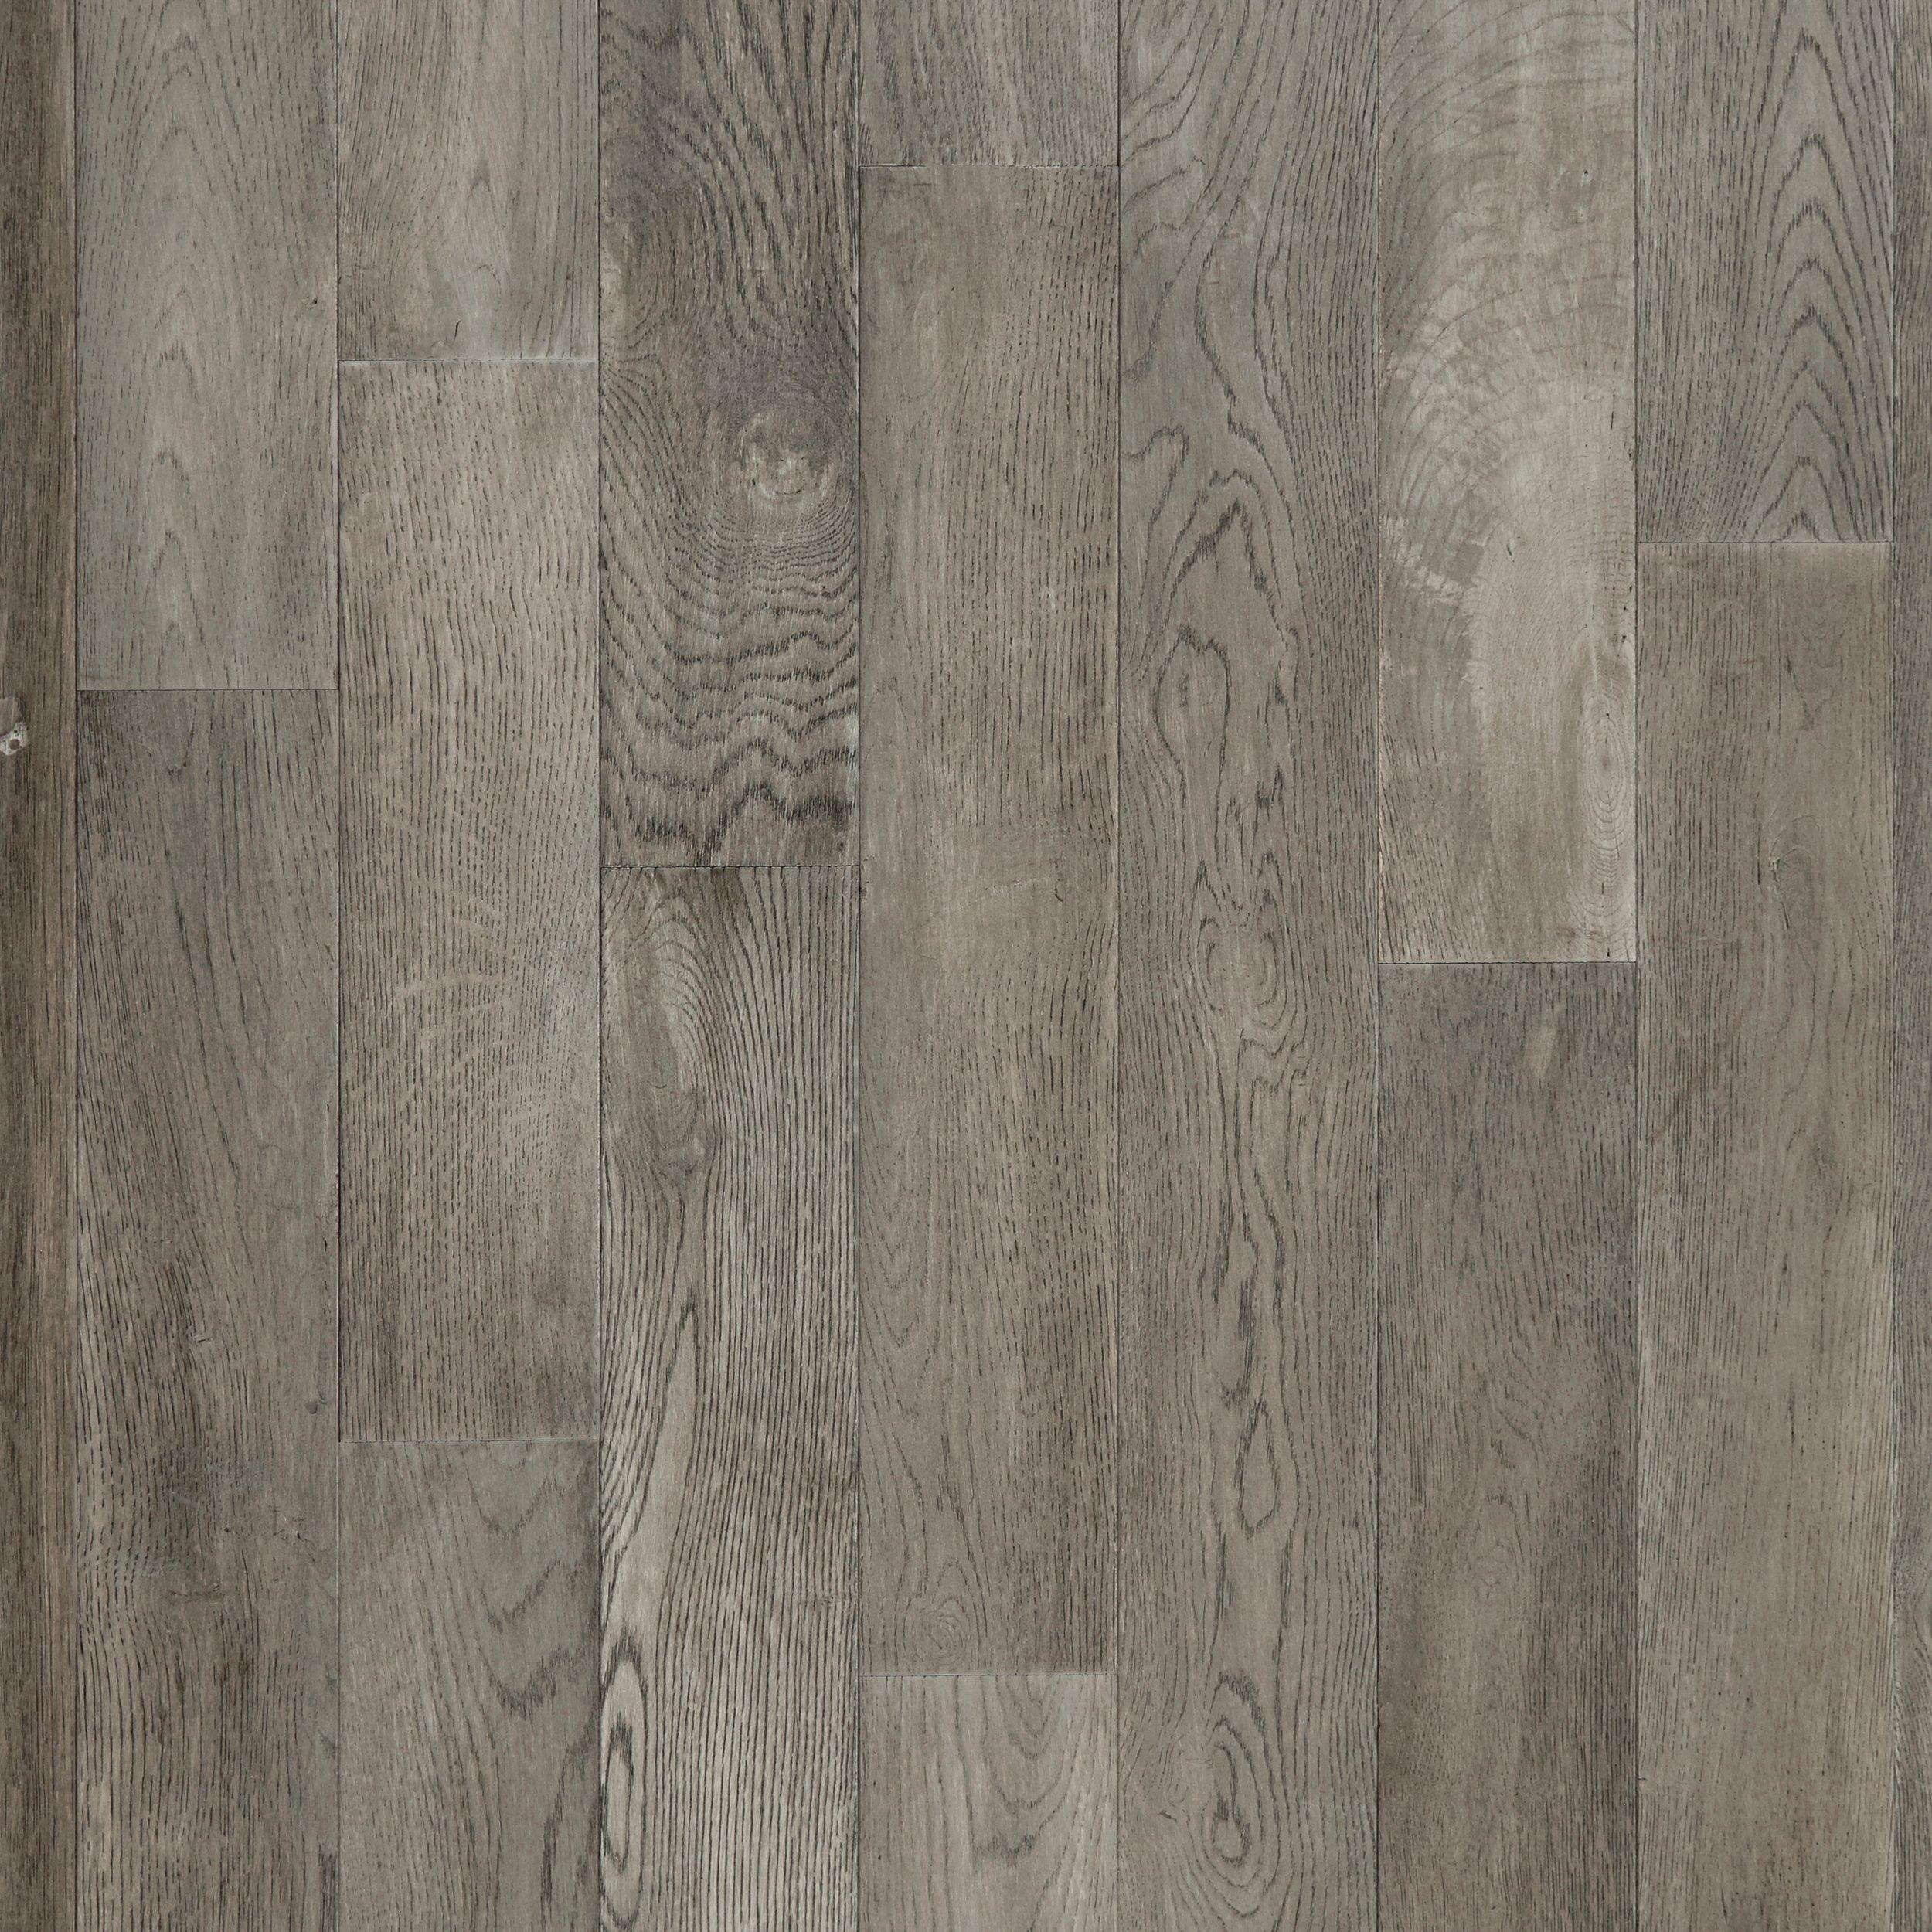 Mid Gray Oak Solid Hardwood Floor Decor Solid Hardwood Floors Grey Hardwood Floors Hardwood Floor Colors